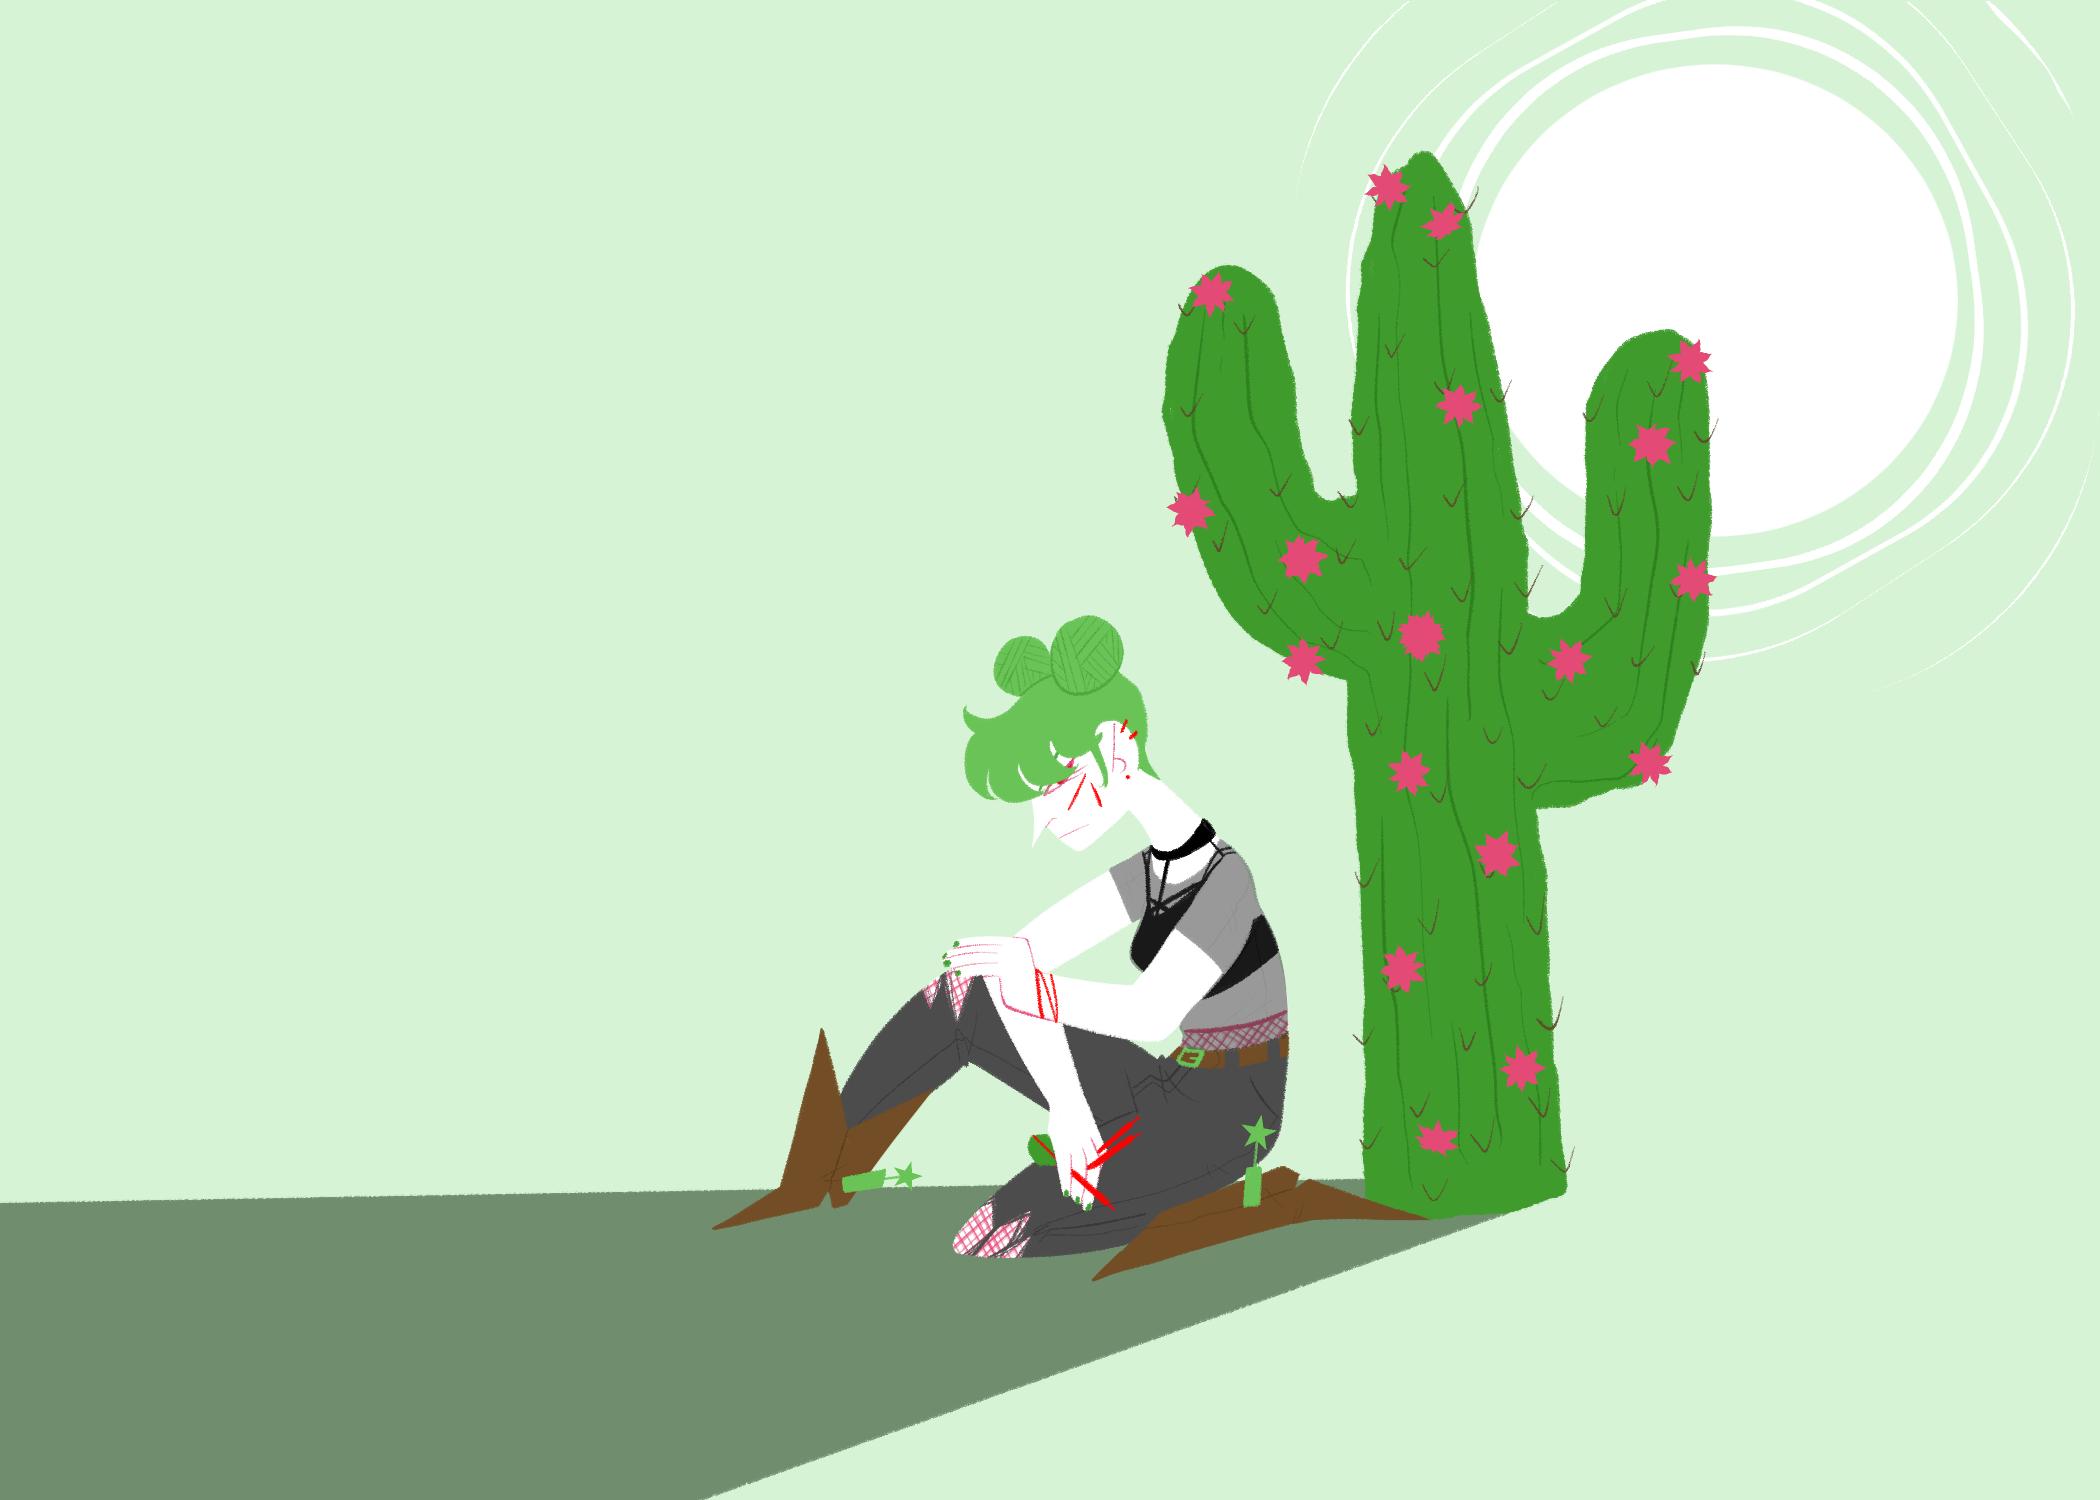 feeling prickly